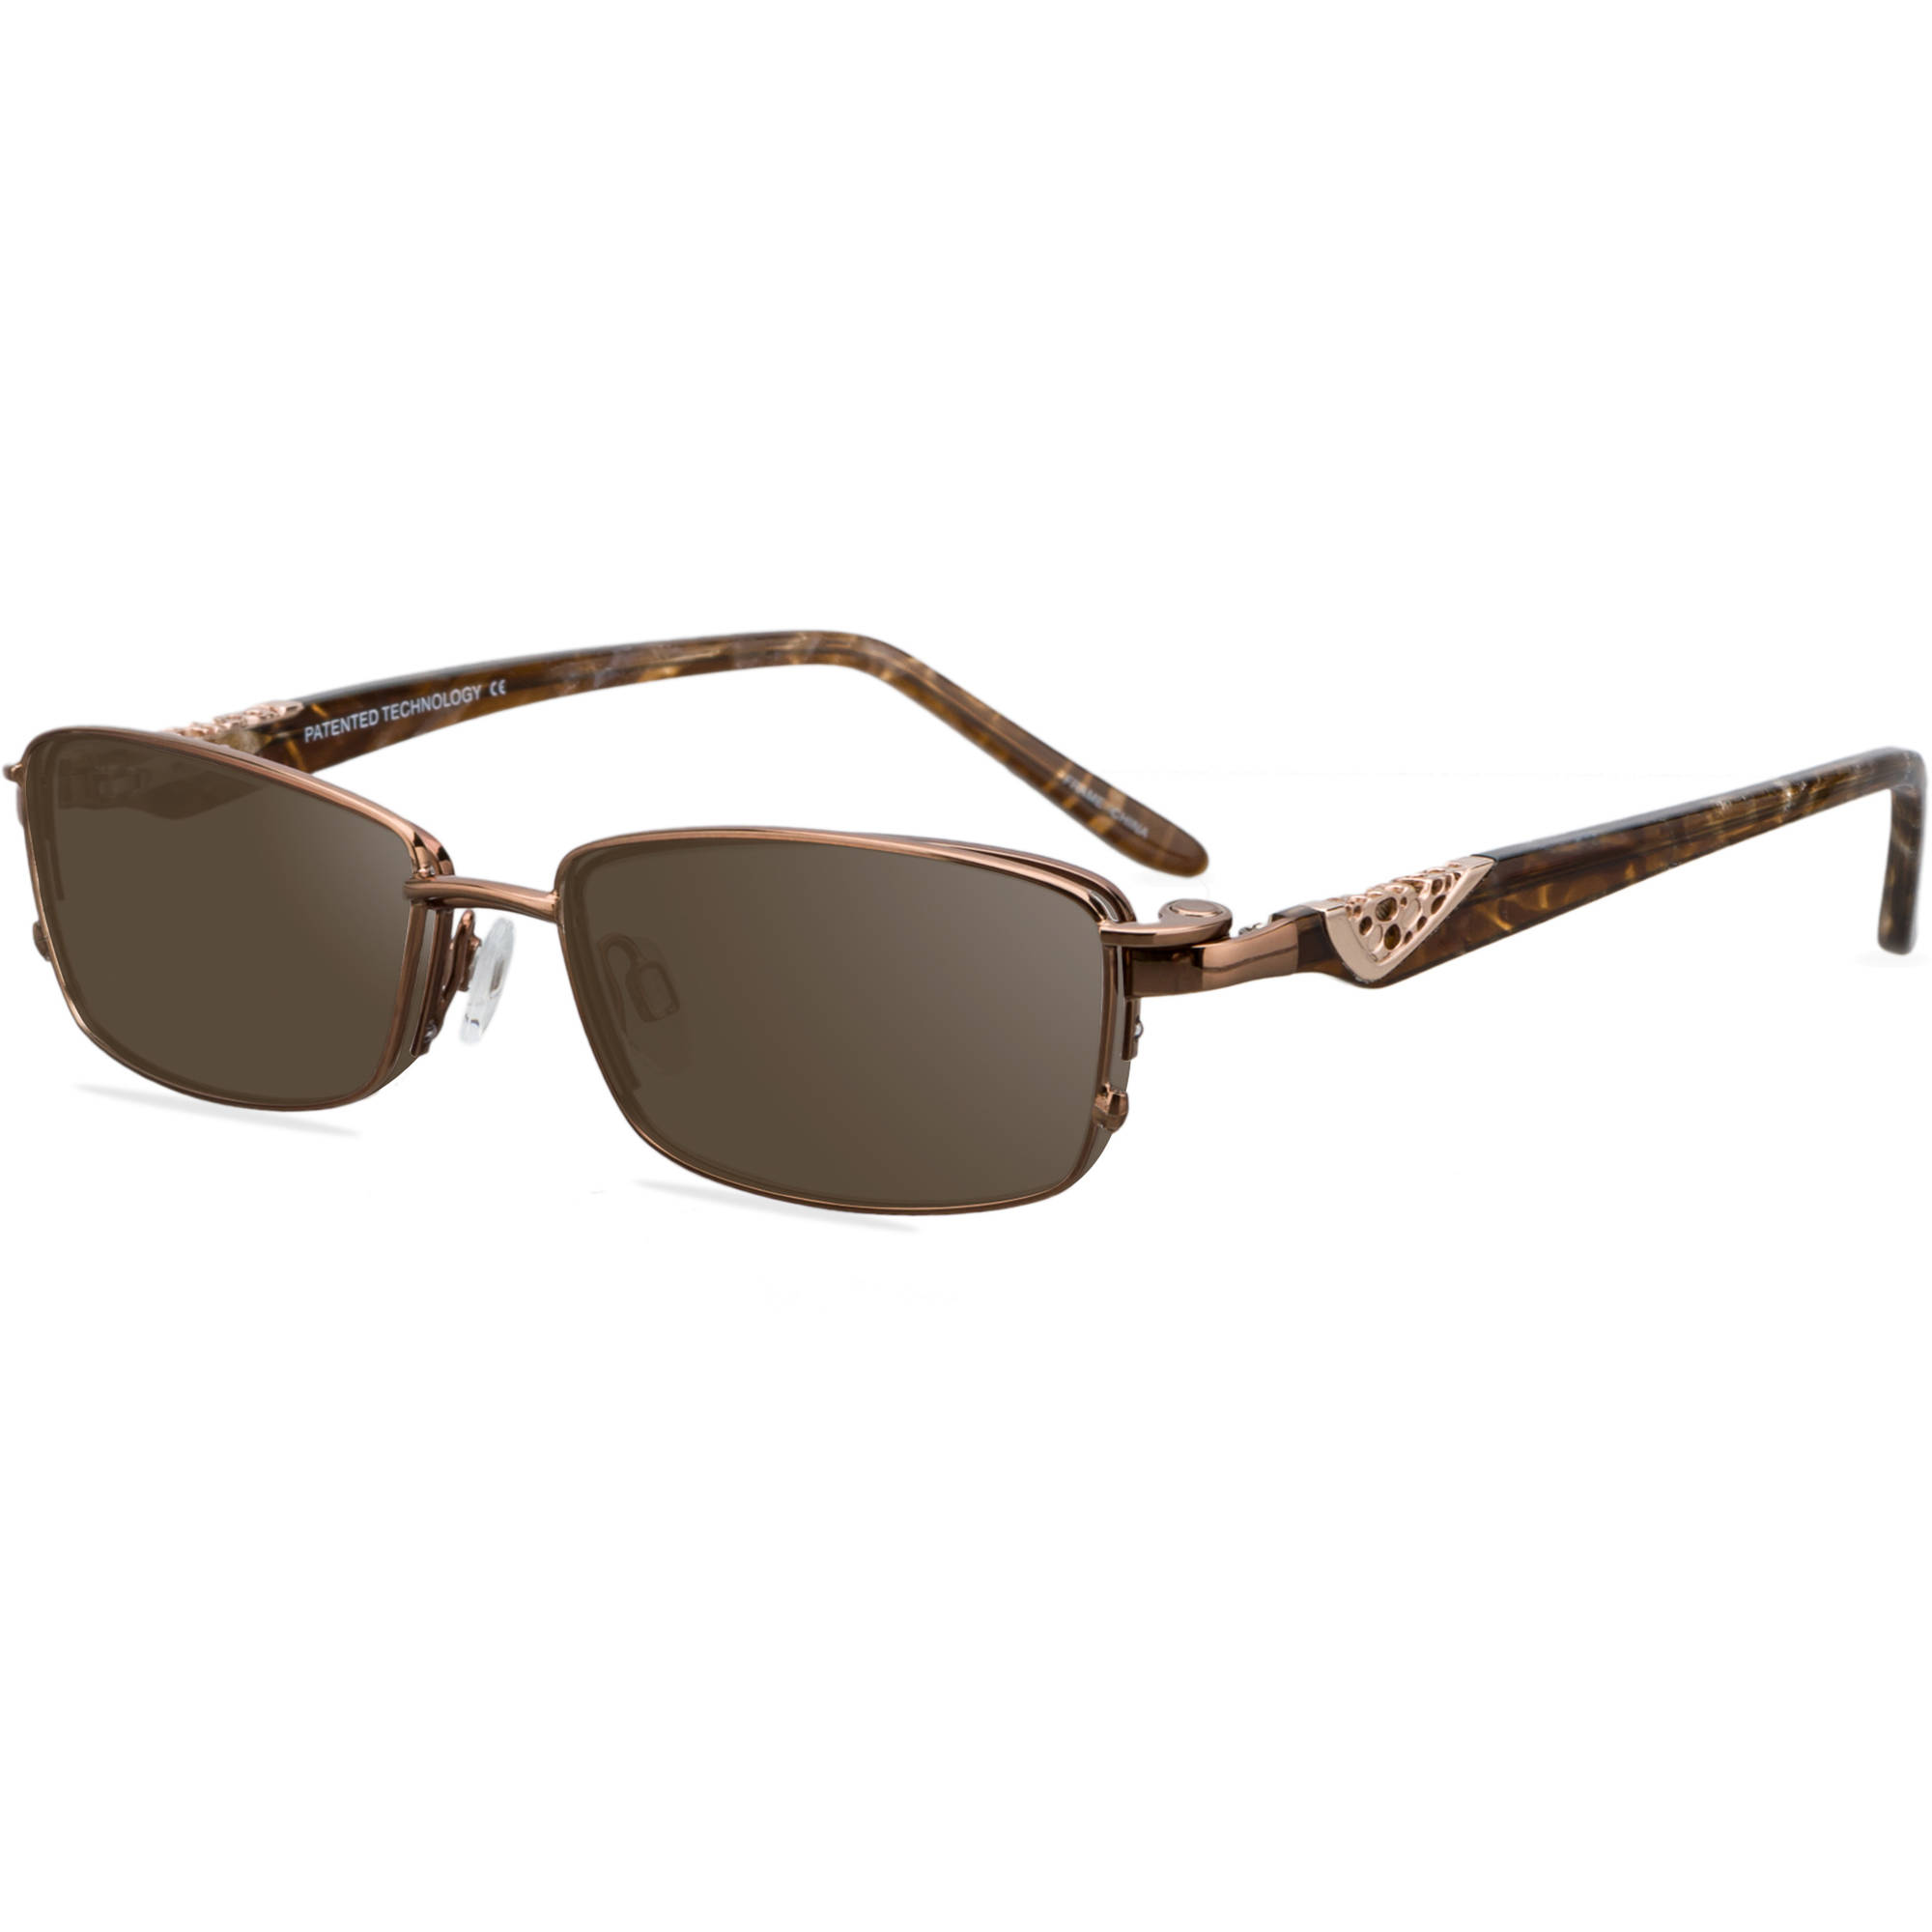 EasyClip Womens Prescription Glasses, S3208 Brown - Walmart.com